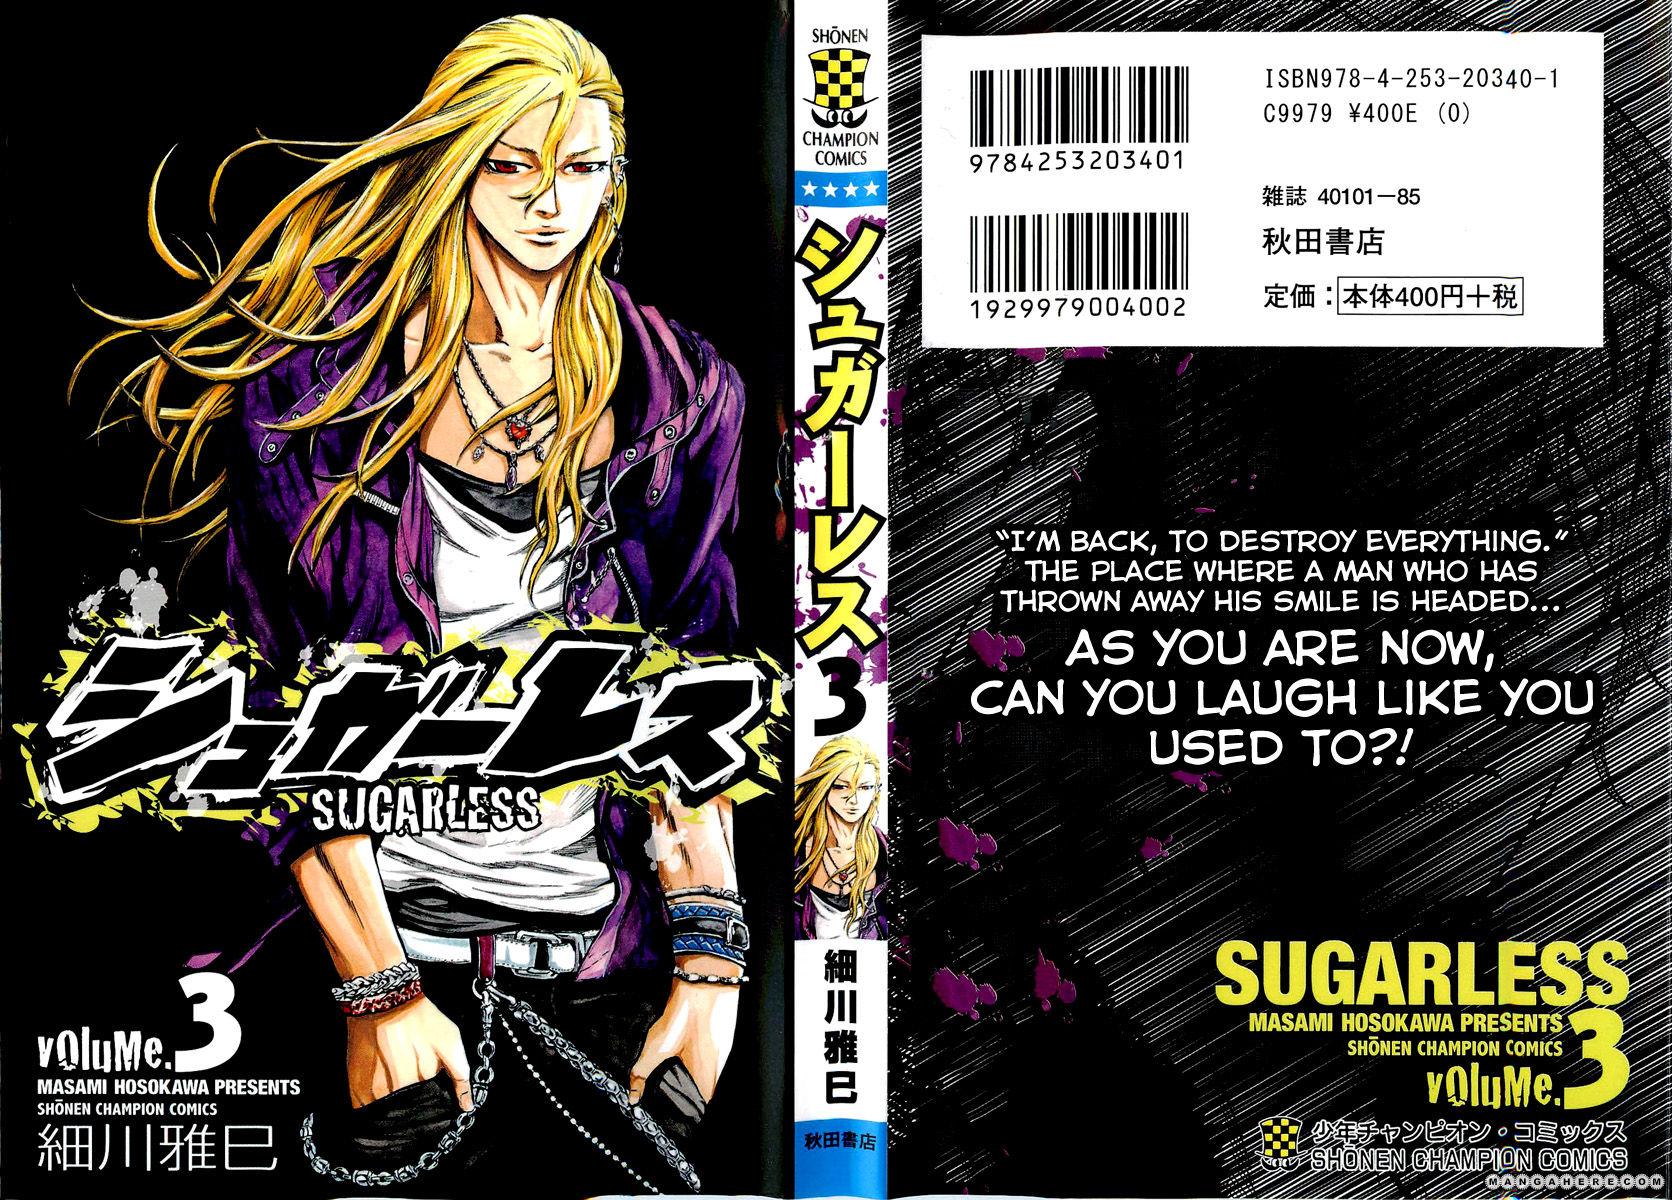 Sugarless (HOSOKAWA Masami) 16 Page 2